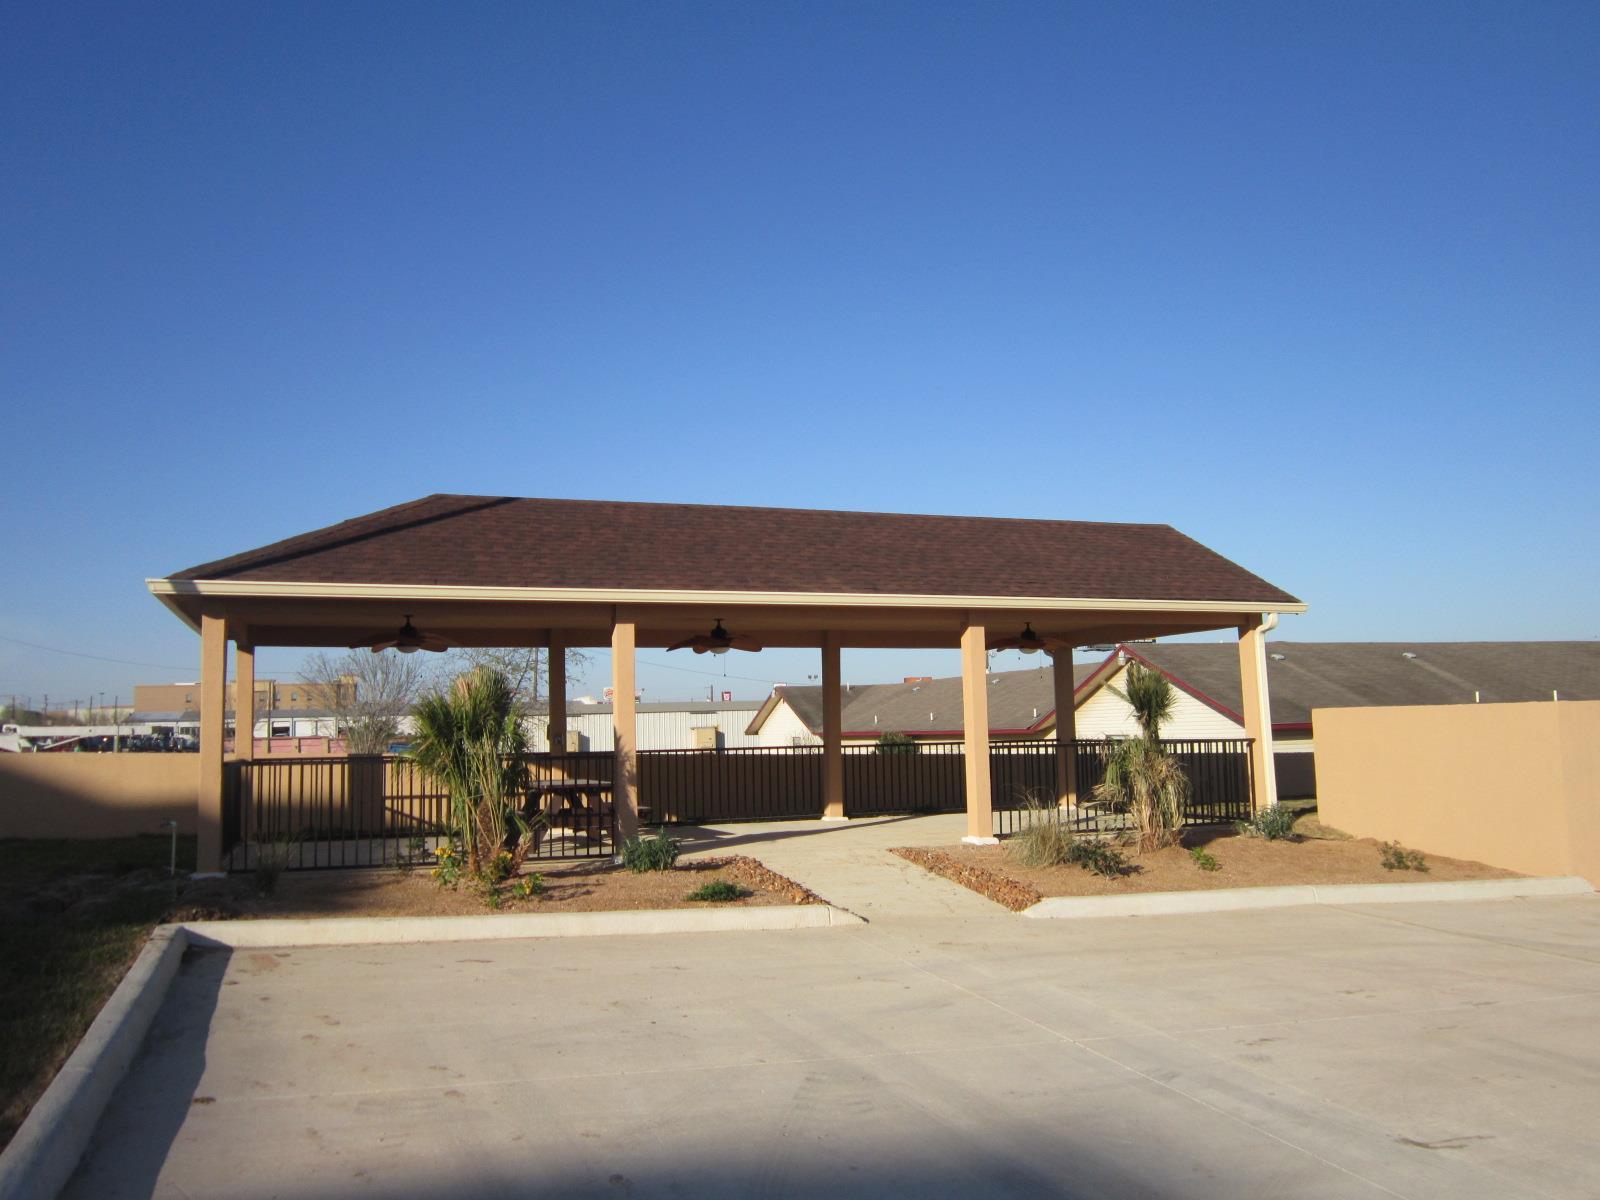 Round Table Pleasanton Ca.Pizza Hut In Pleasanton Ca Www Utrechtart Com